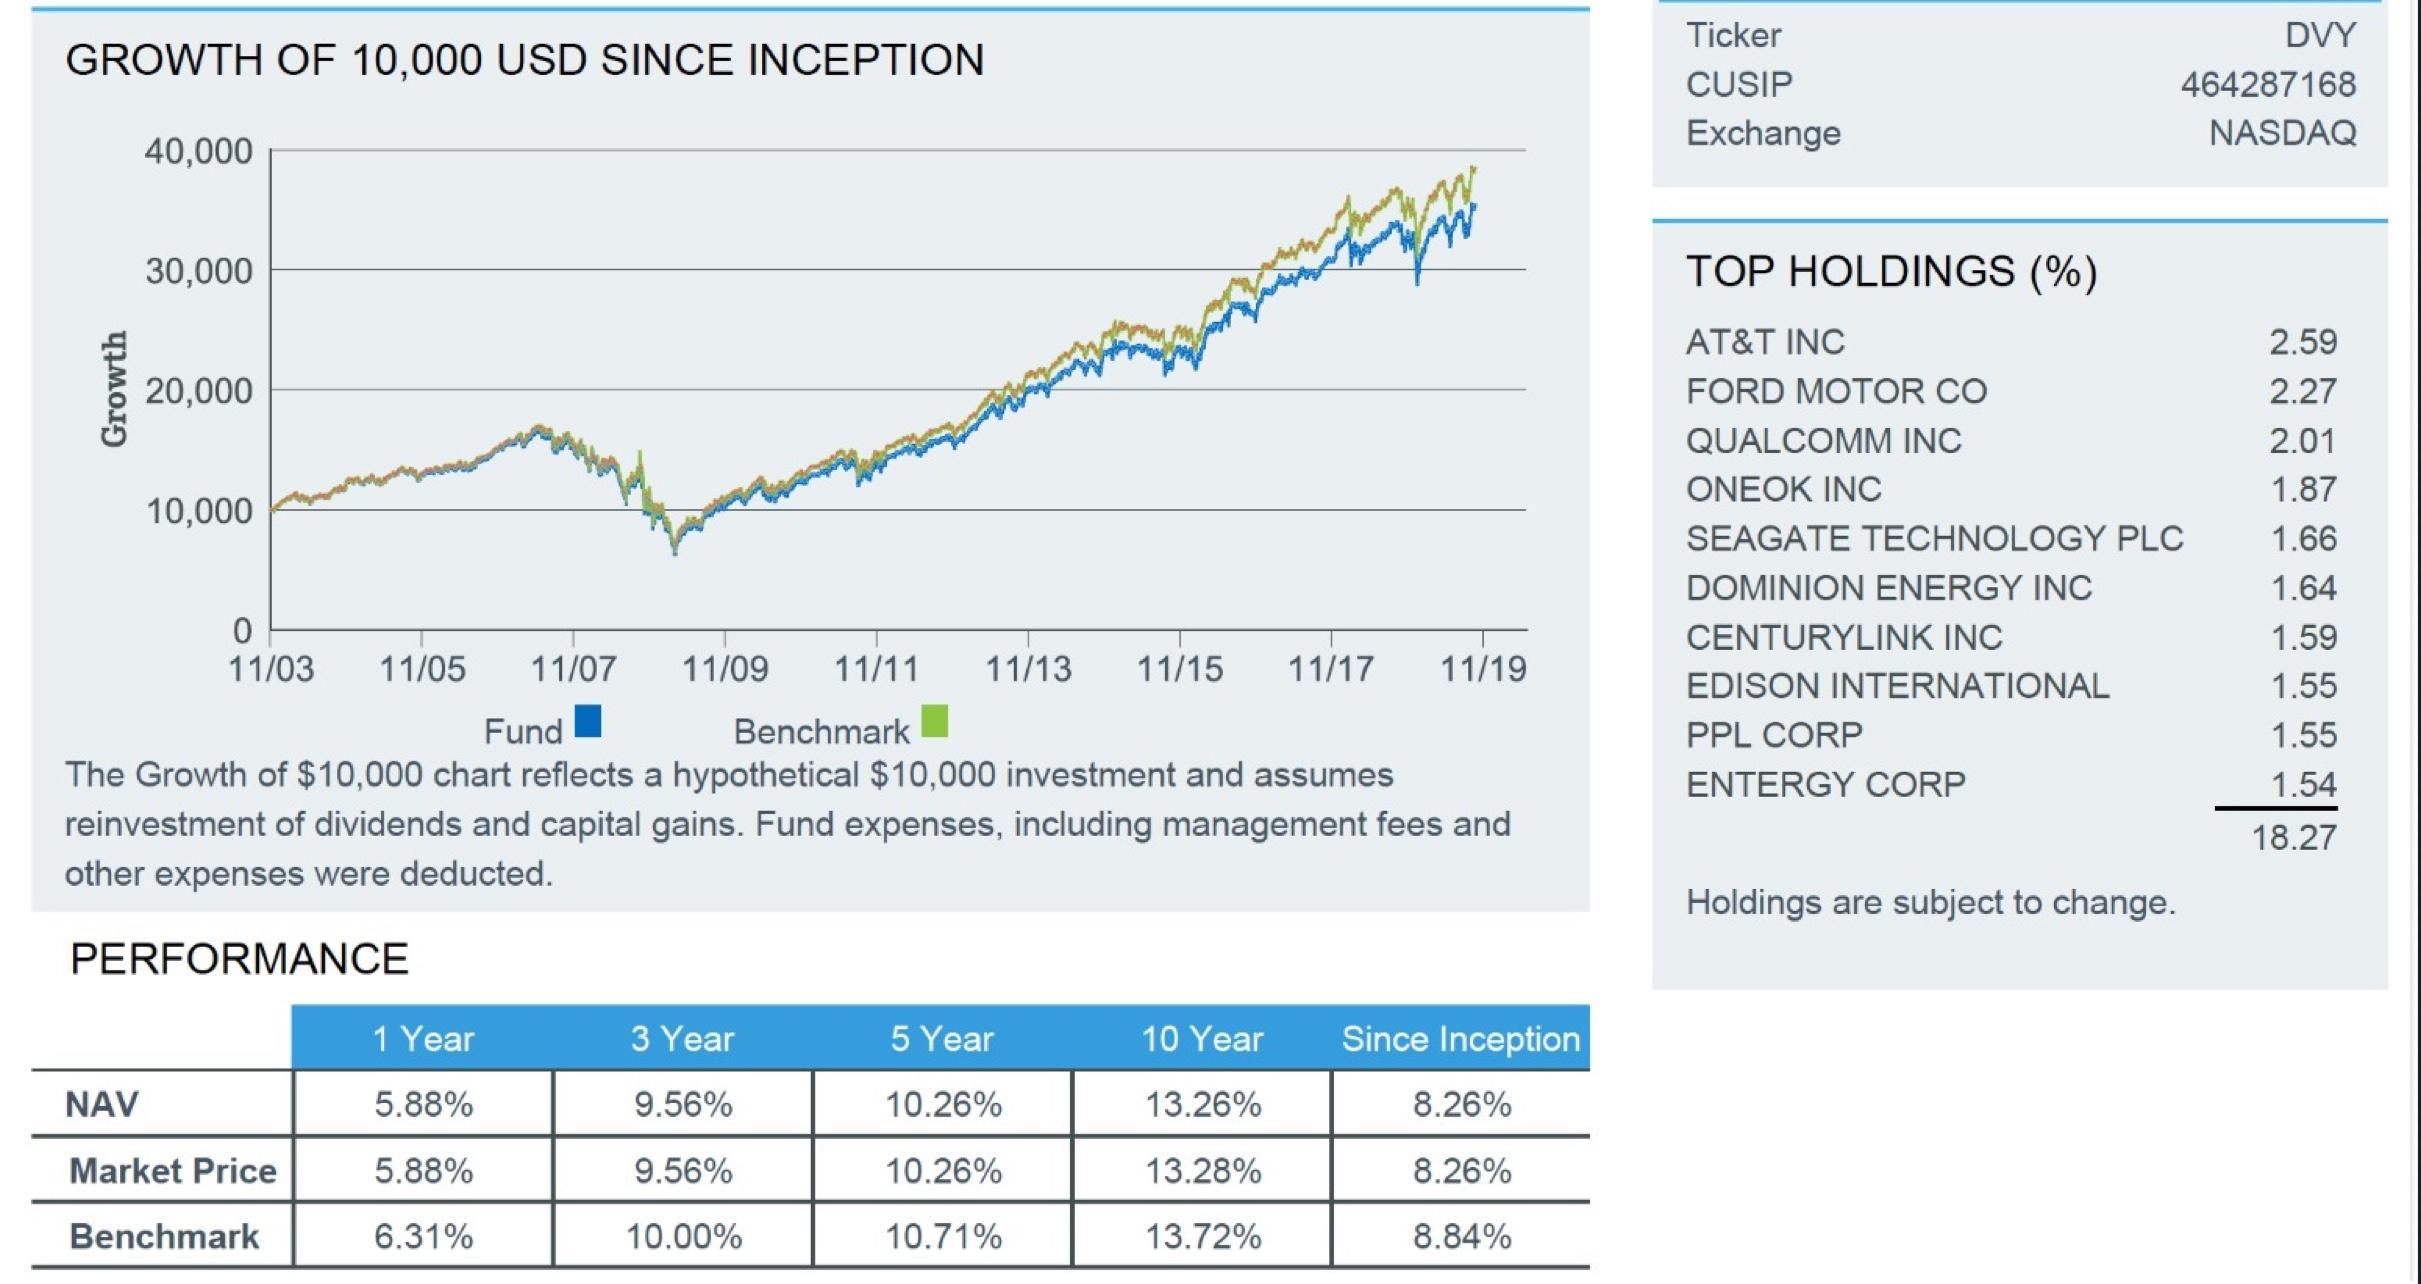 Dvy dividend reinvestment cost kcs 100brokerforex